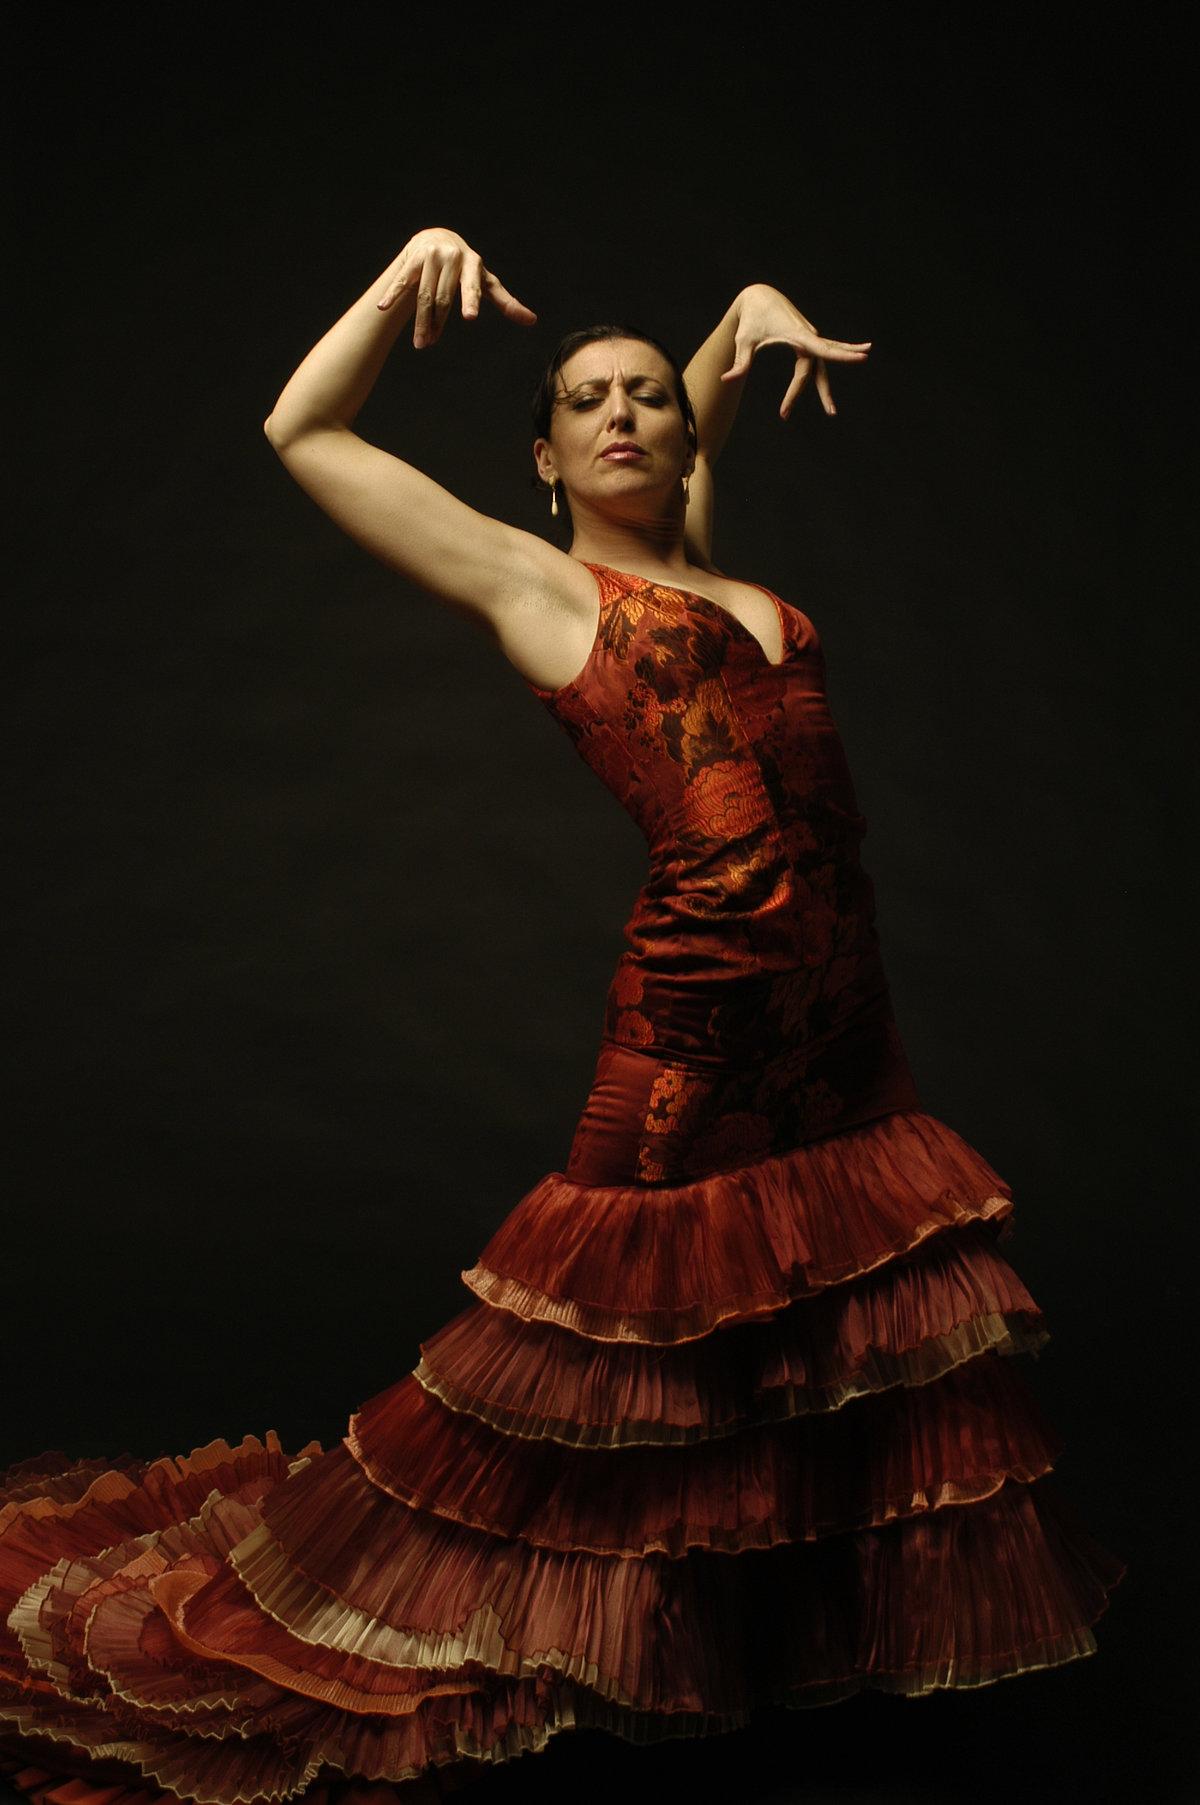 того, танцовщица фламенко картинки все модели сайте